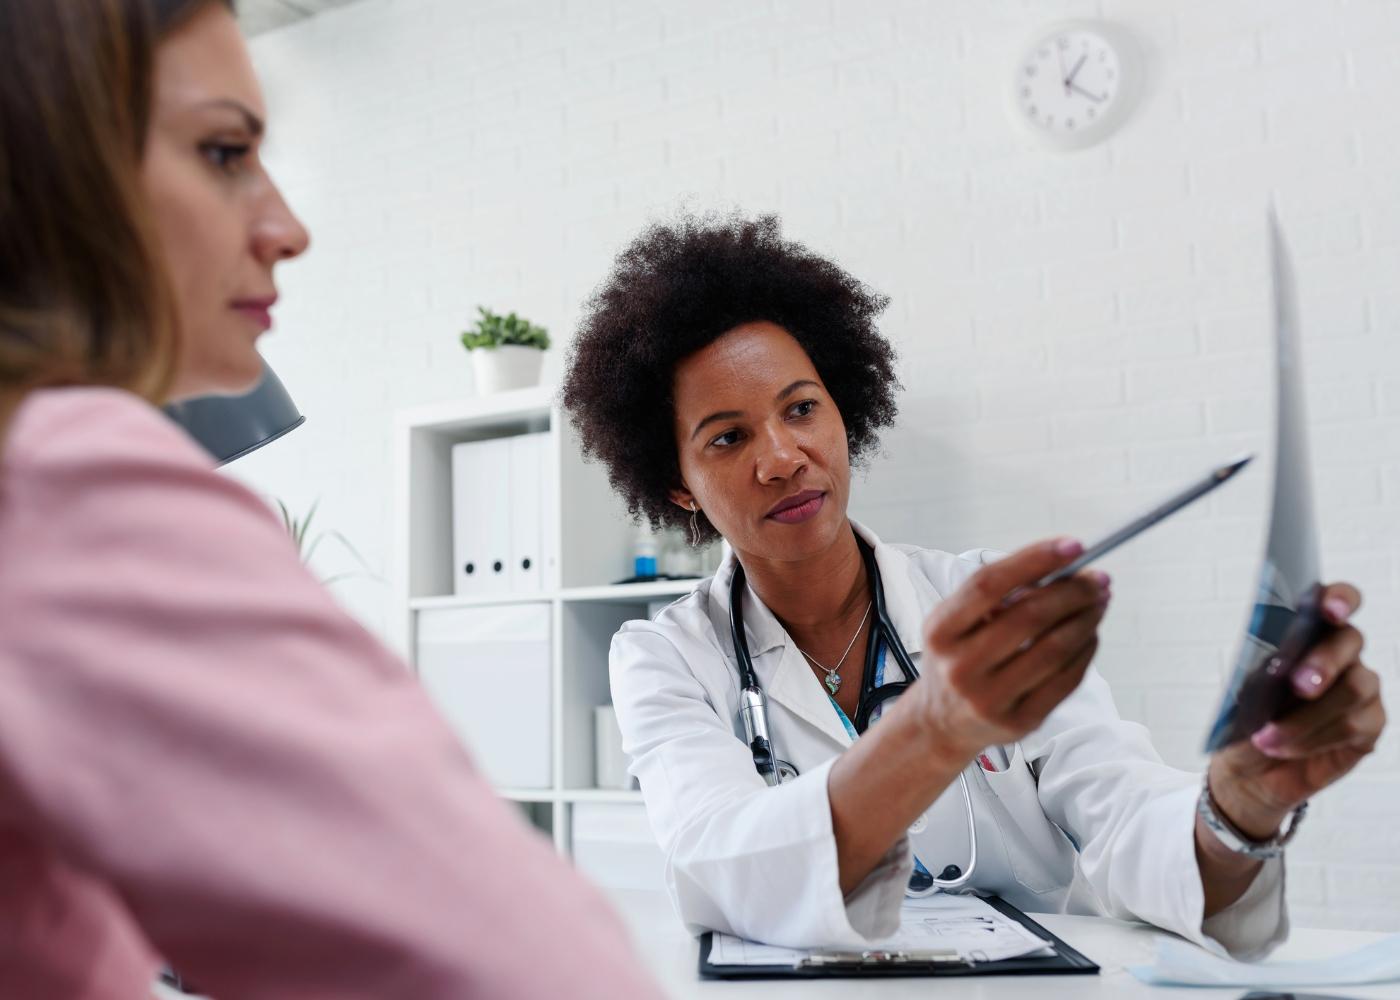 mulher numa consulta médica